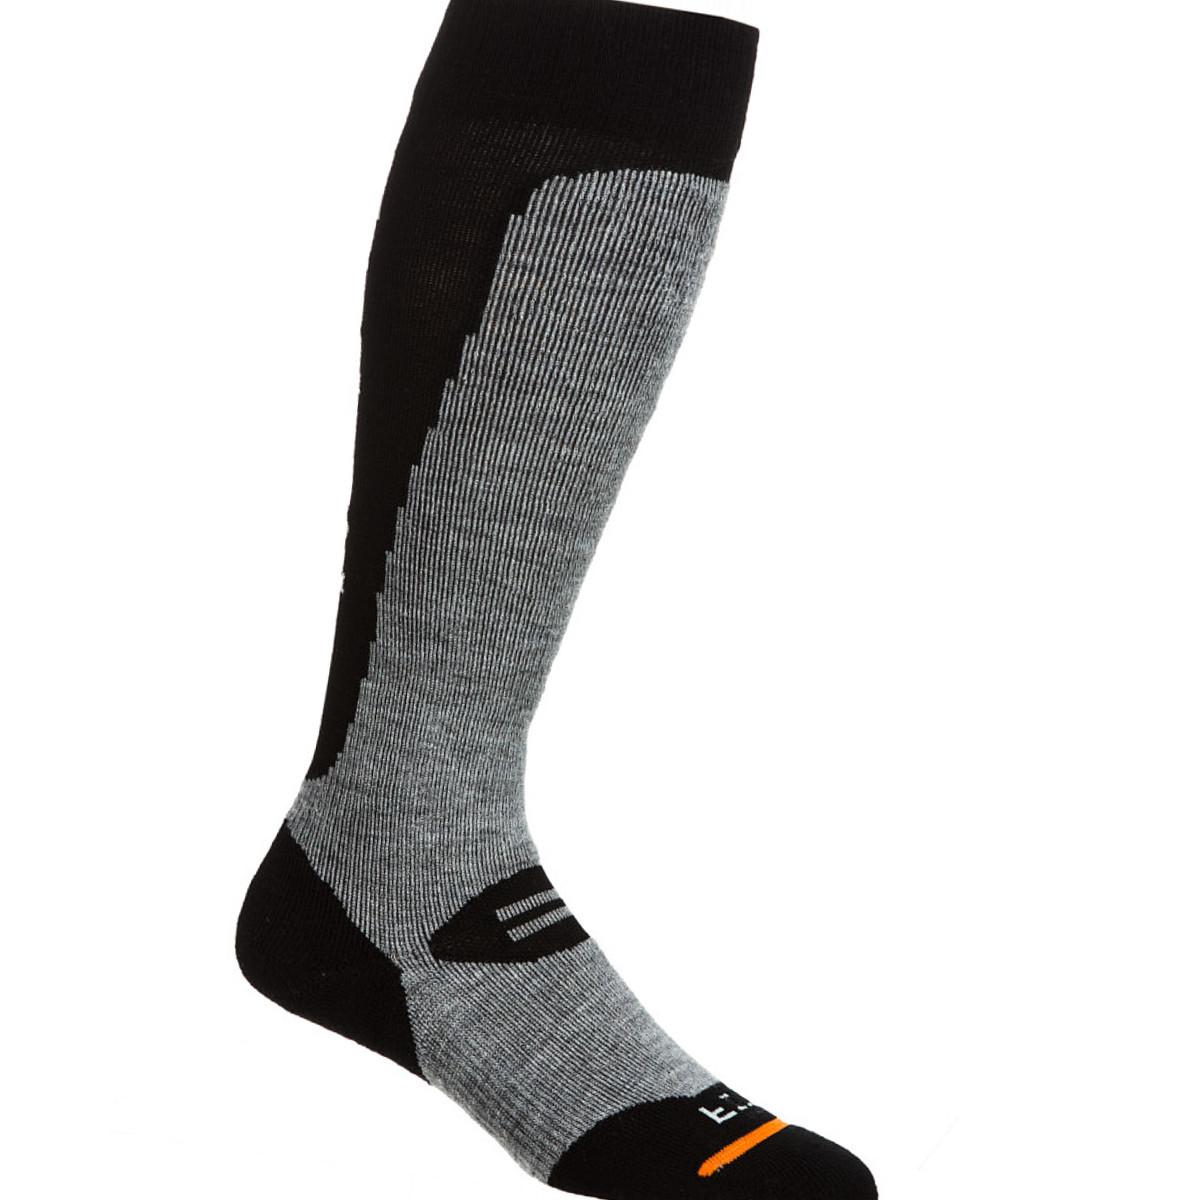 FITS Medium Ski Over The Calf Socks - Men's